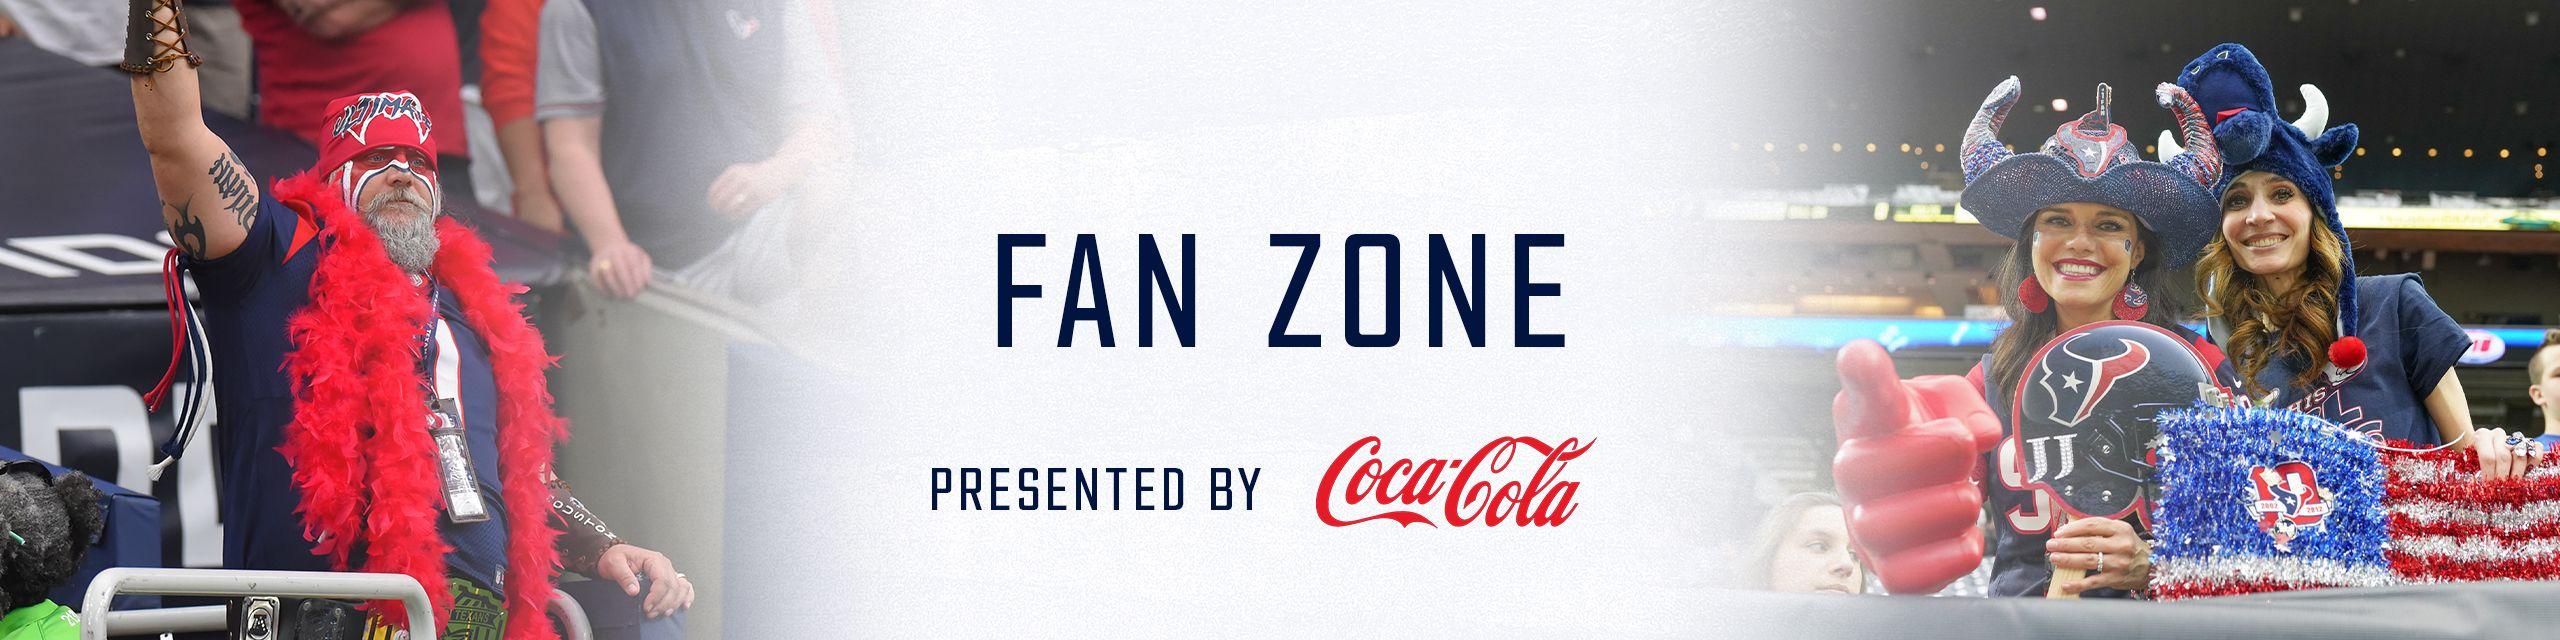 Fan Zone. presented by Coca-Cola